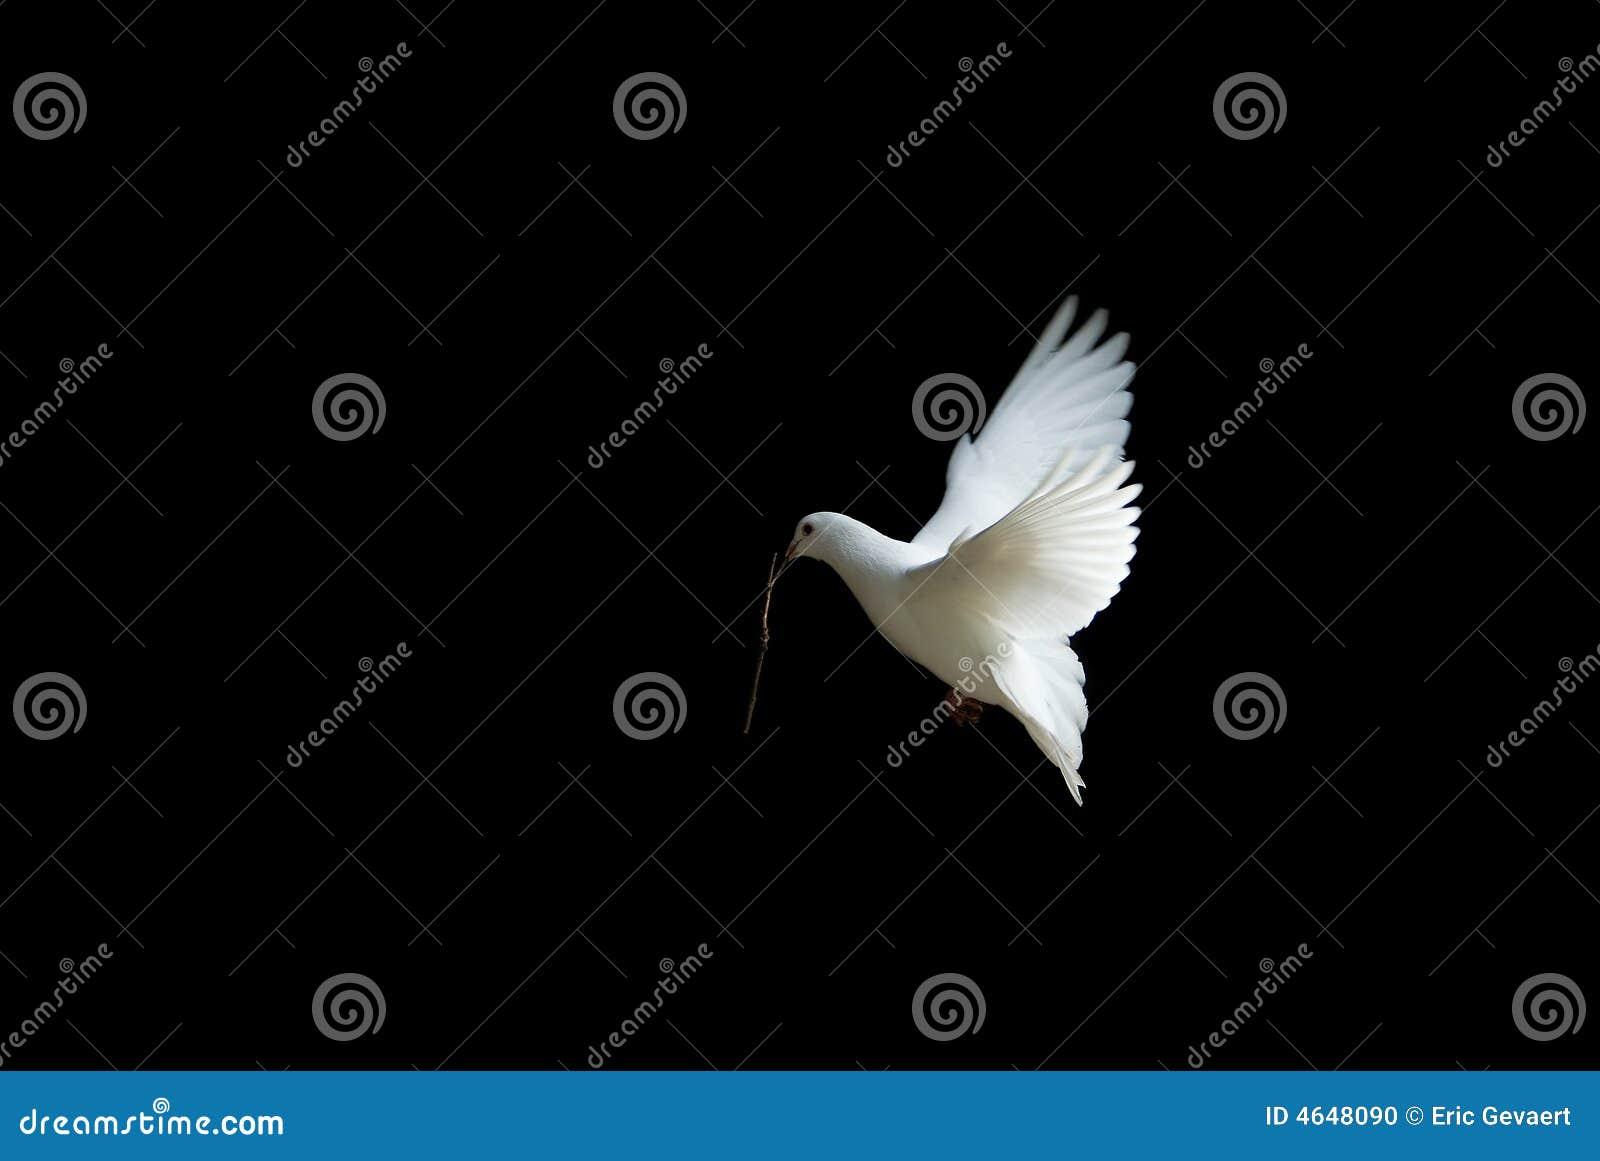 Best stock photos of illustration Dove in flight illustration